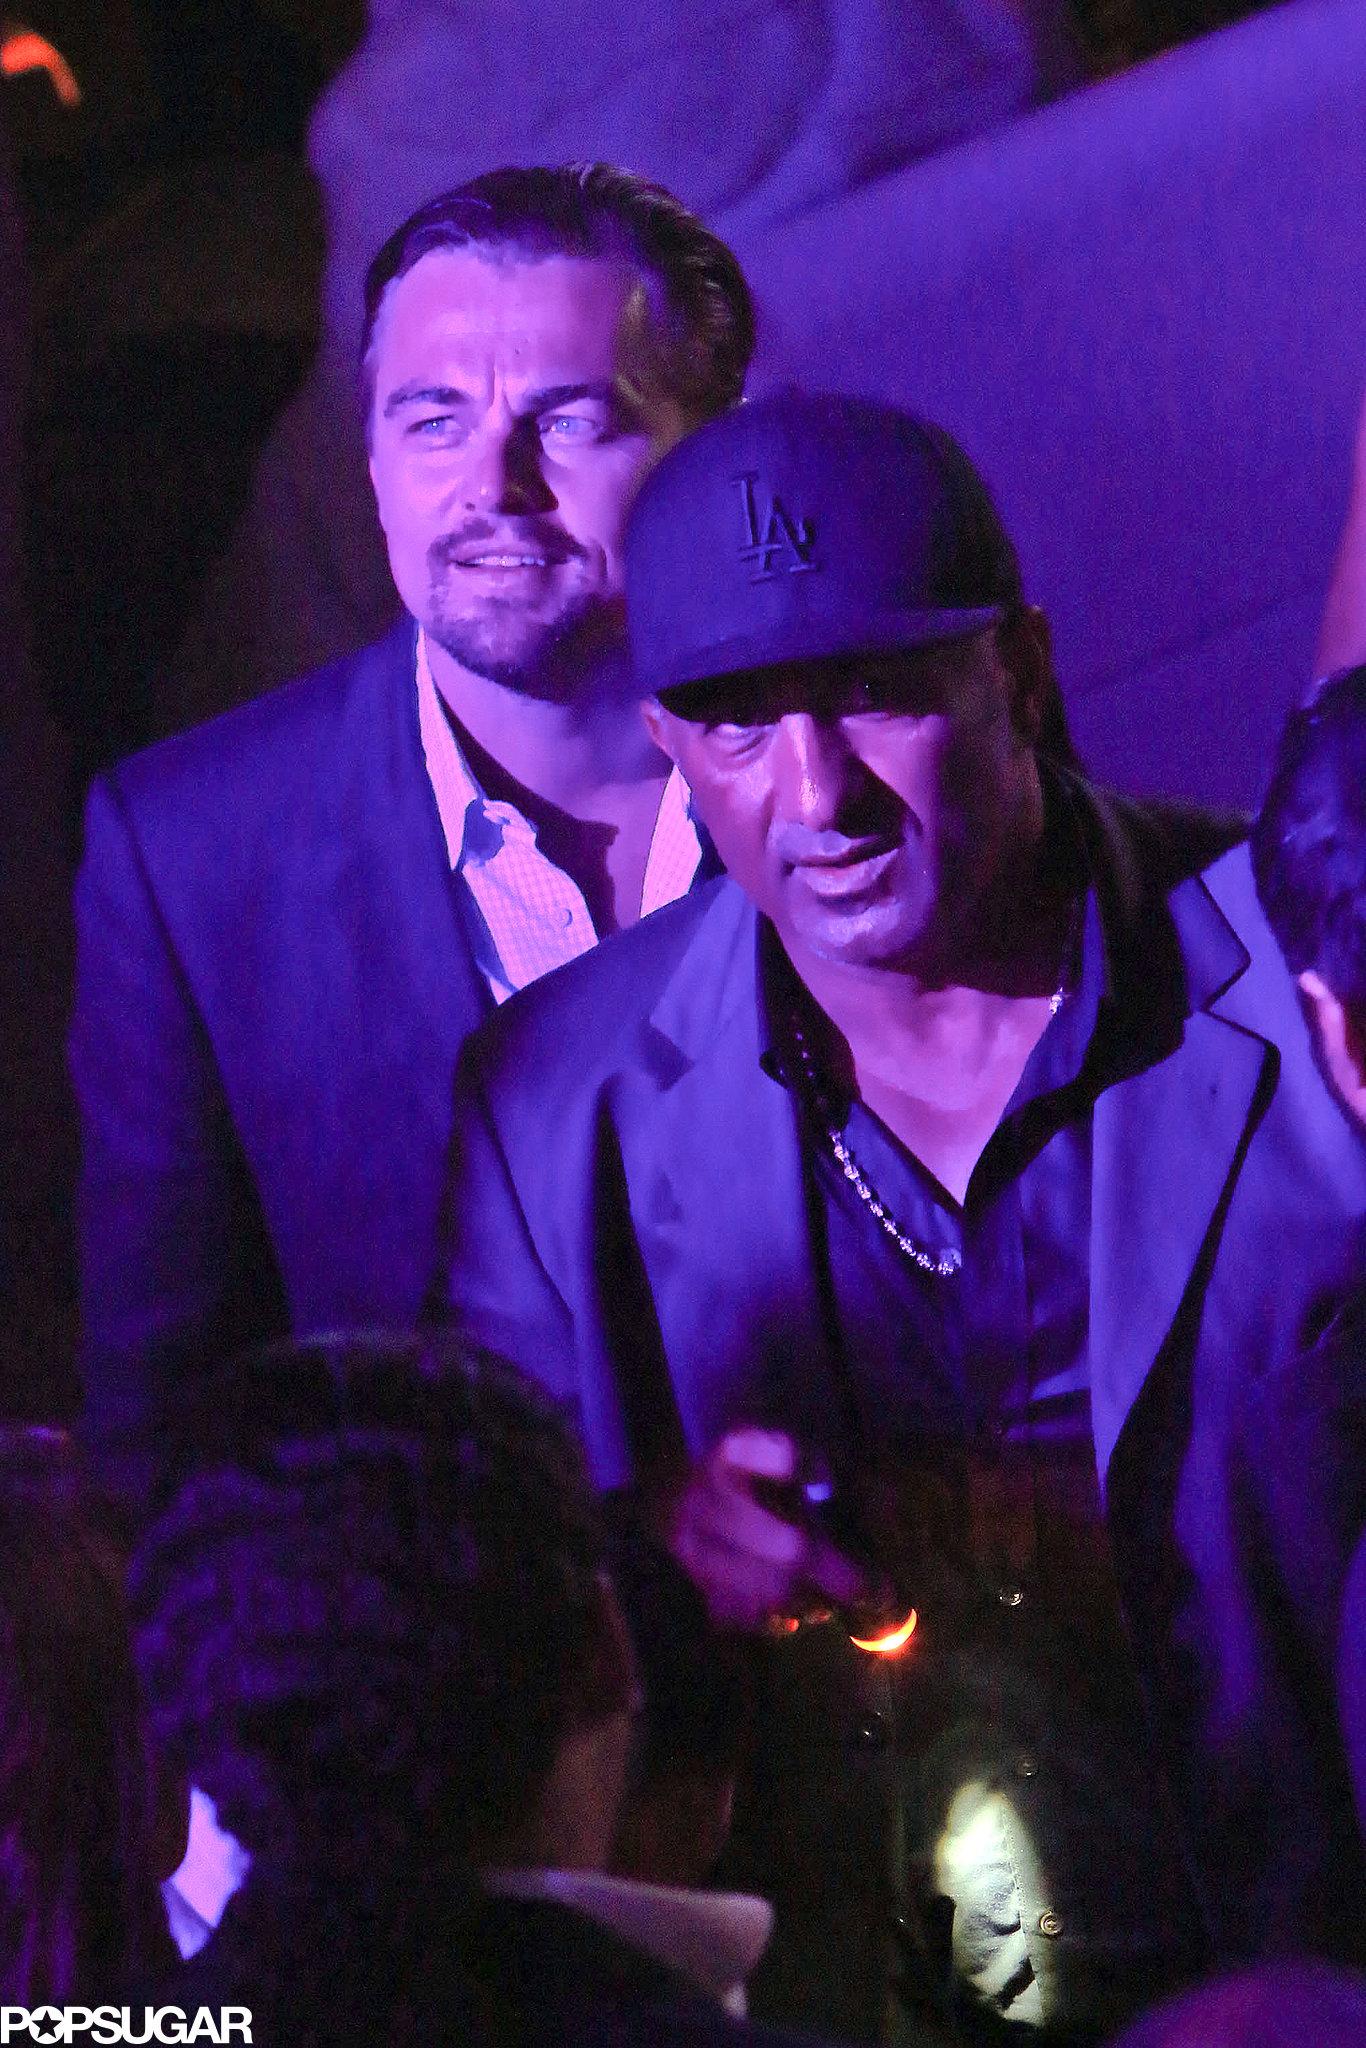 Leonardo Dicaprio Partied At The Eden Roc Hotel For The De